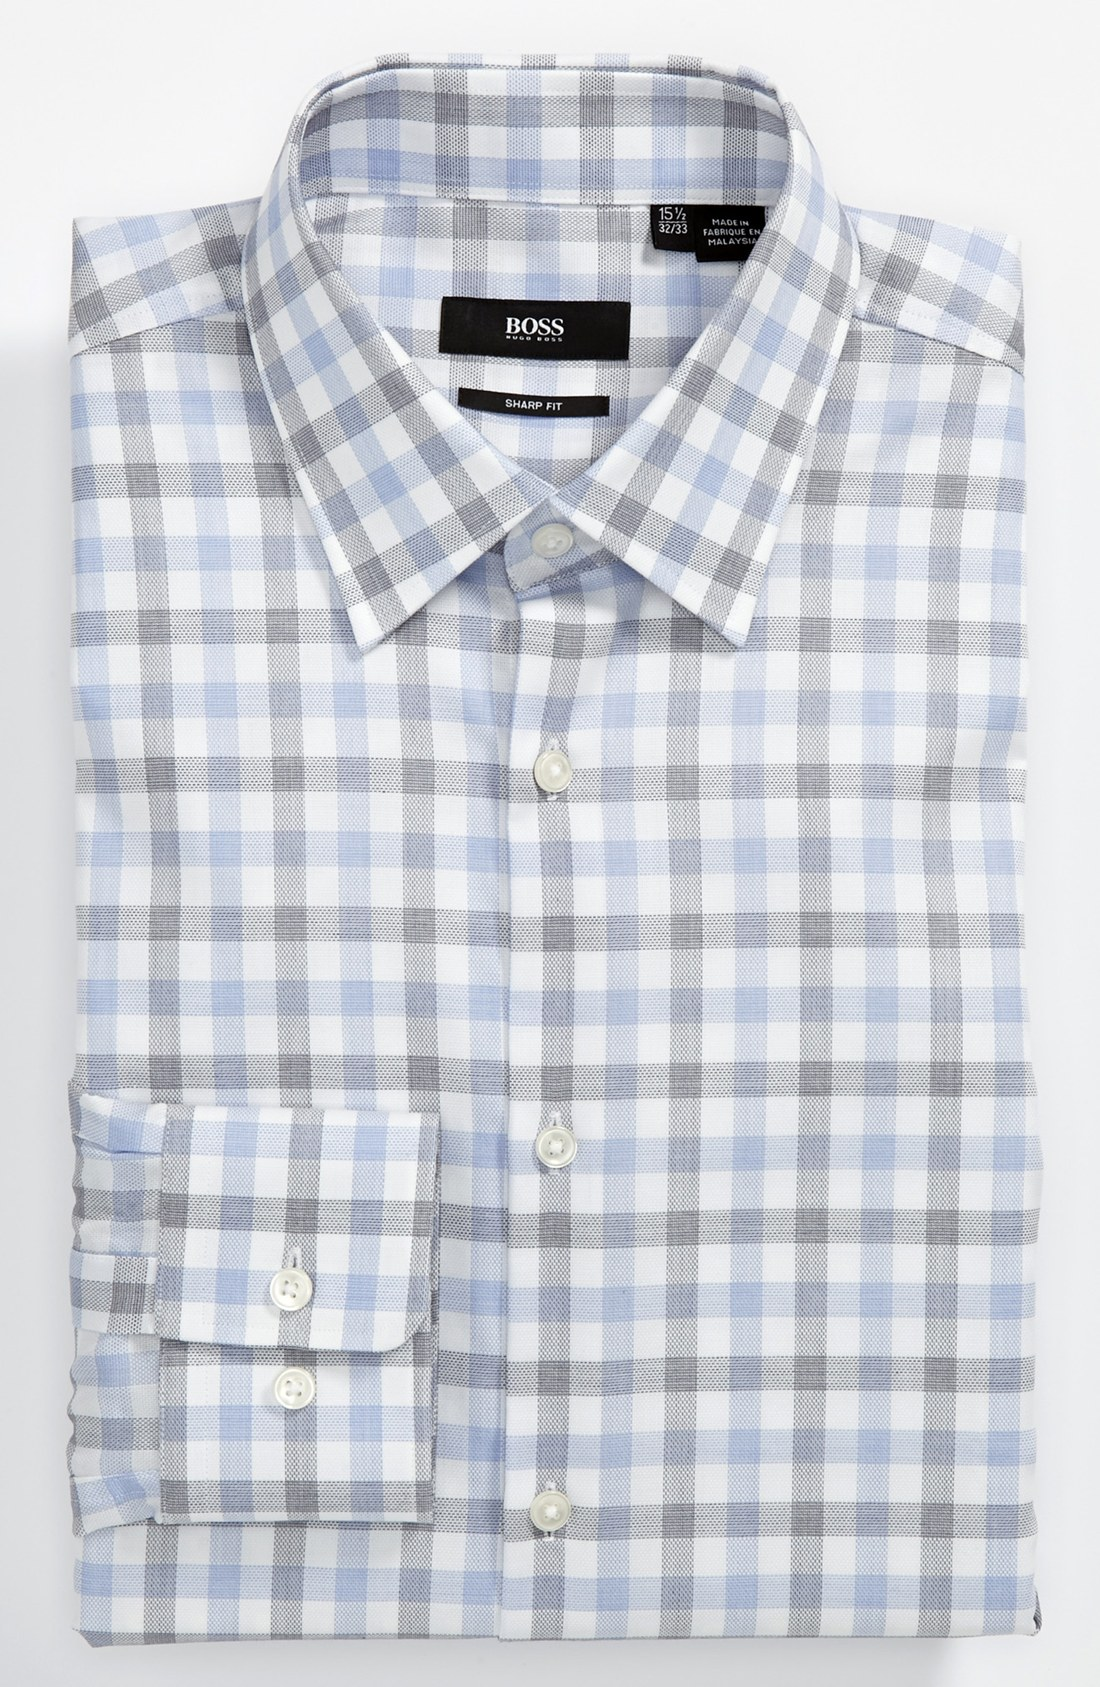 Boss by hugo boss sharp fit dress shirt in blue for men lyst for Hugo boss dress shirts